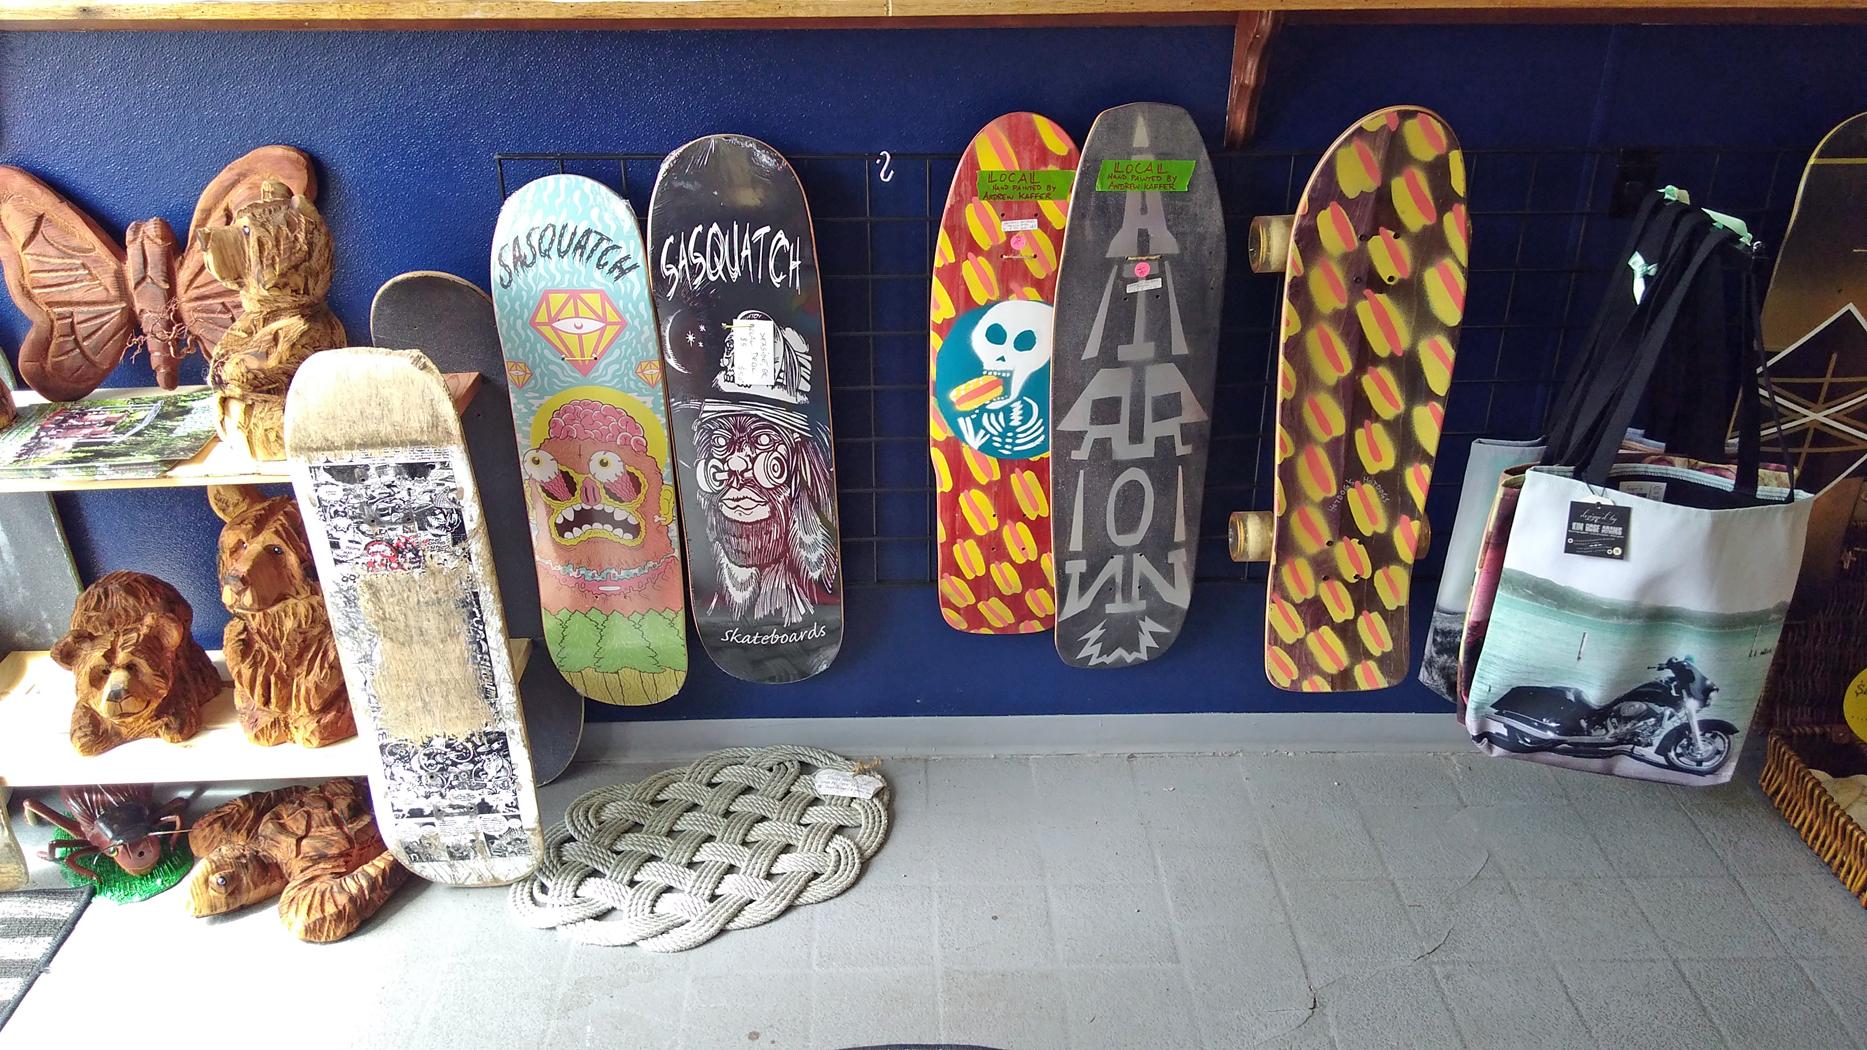 skate-shop-totes-riverfront-trading-coldwater-astoria.jpg